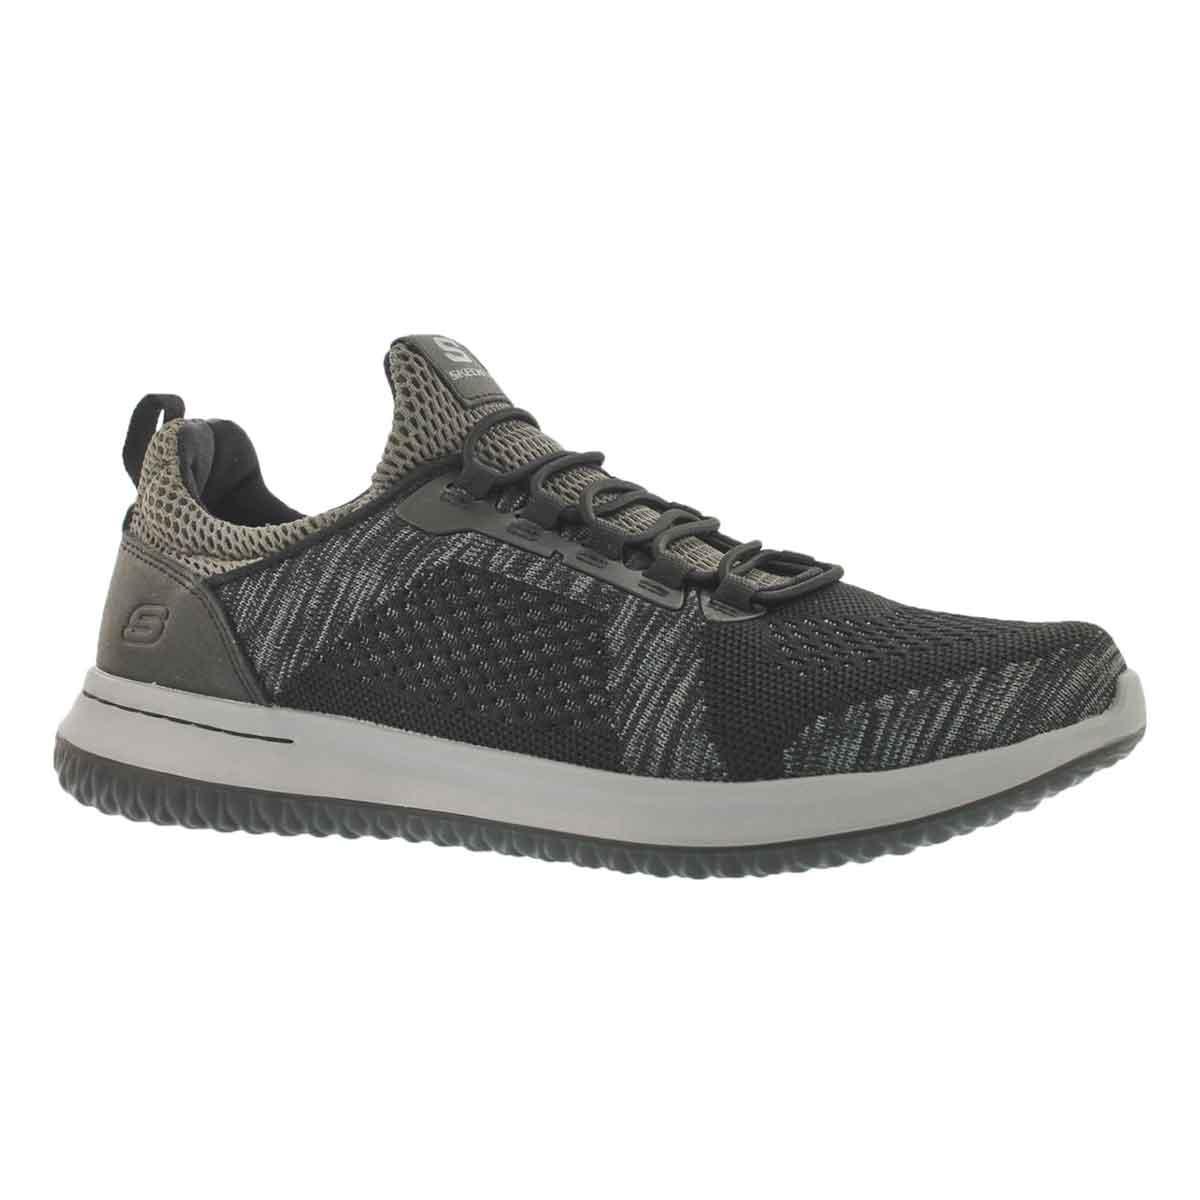 Men's DELSON BREWTON blk/char slip on sneakers